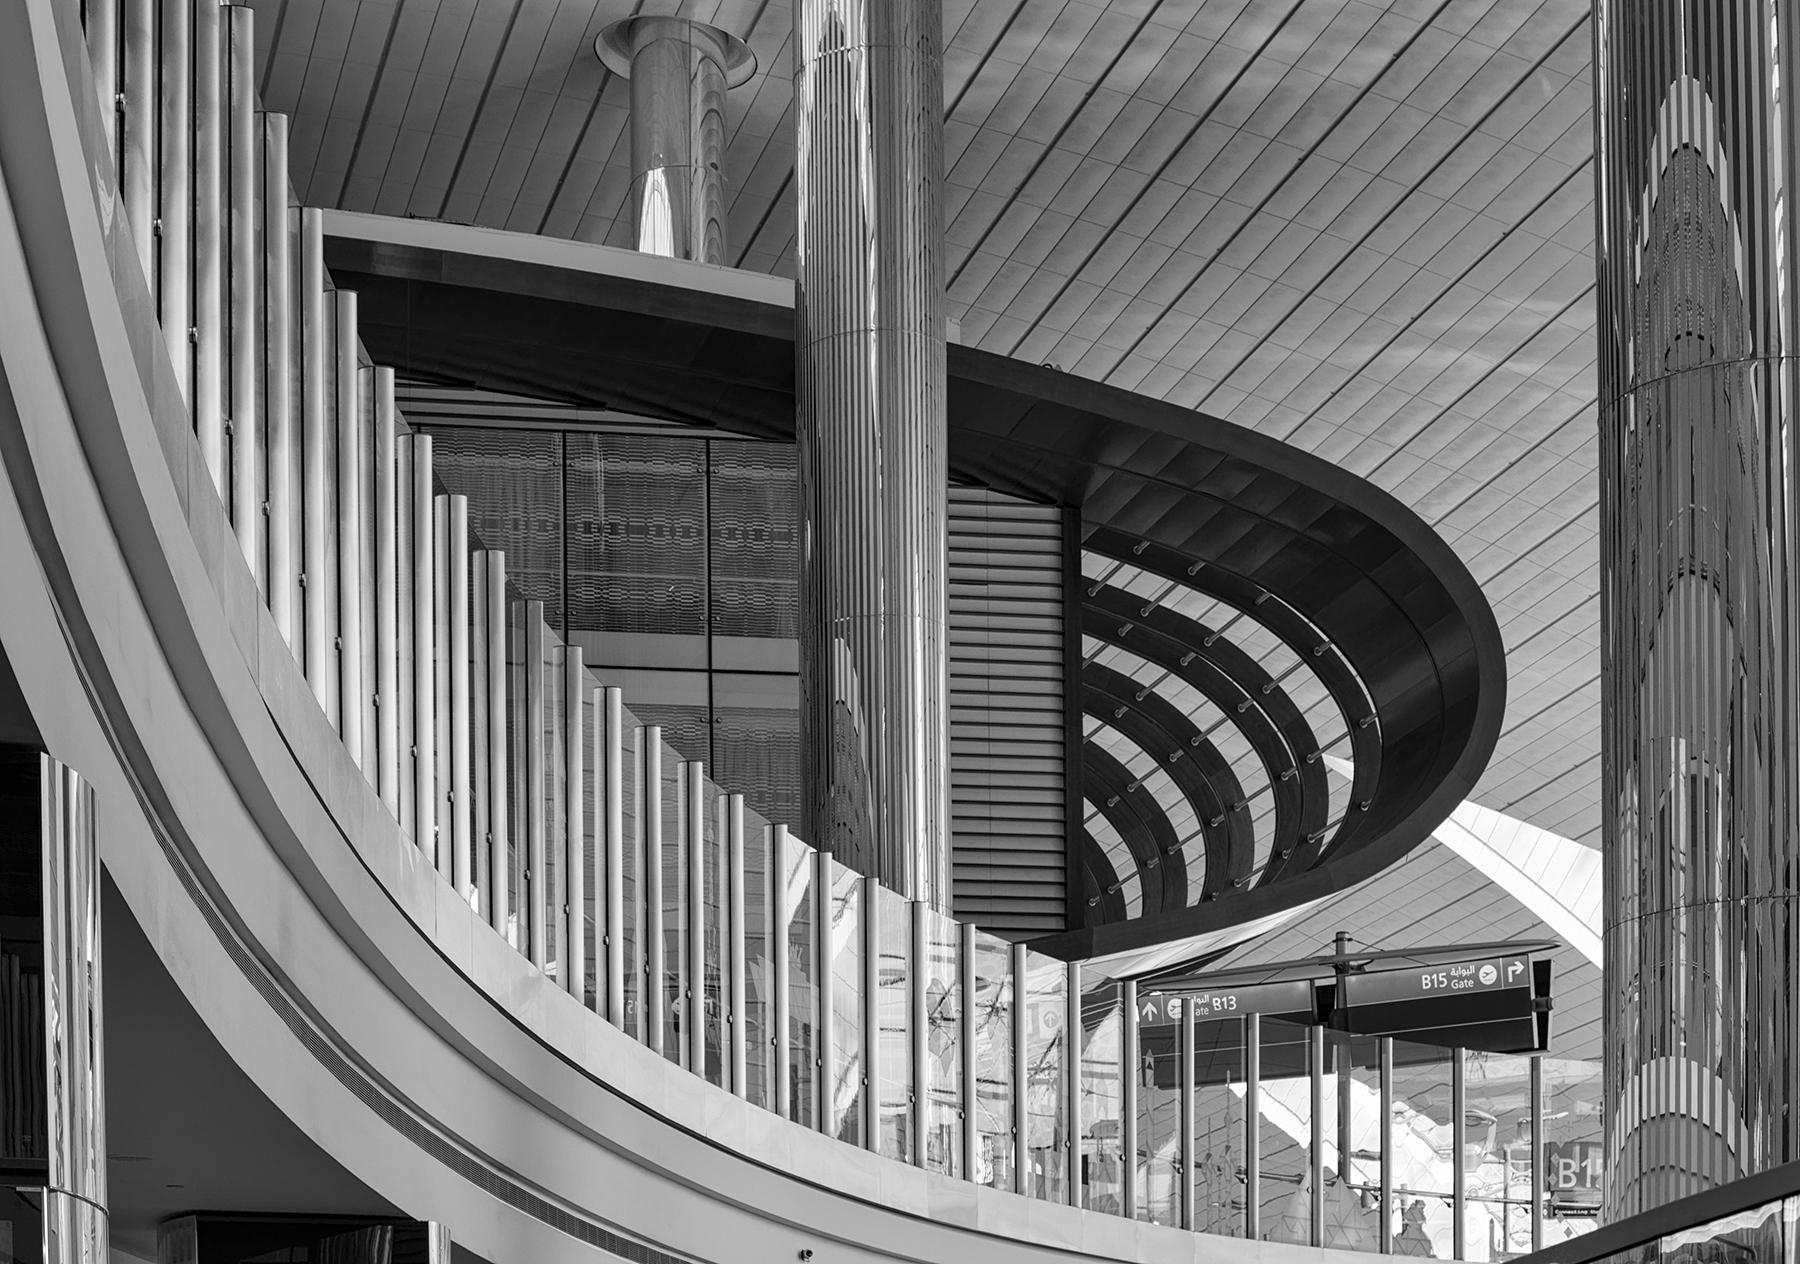 Brian_Jones_Whorls_Whorl 1 - Dubai Airport_1.jpg